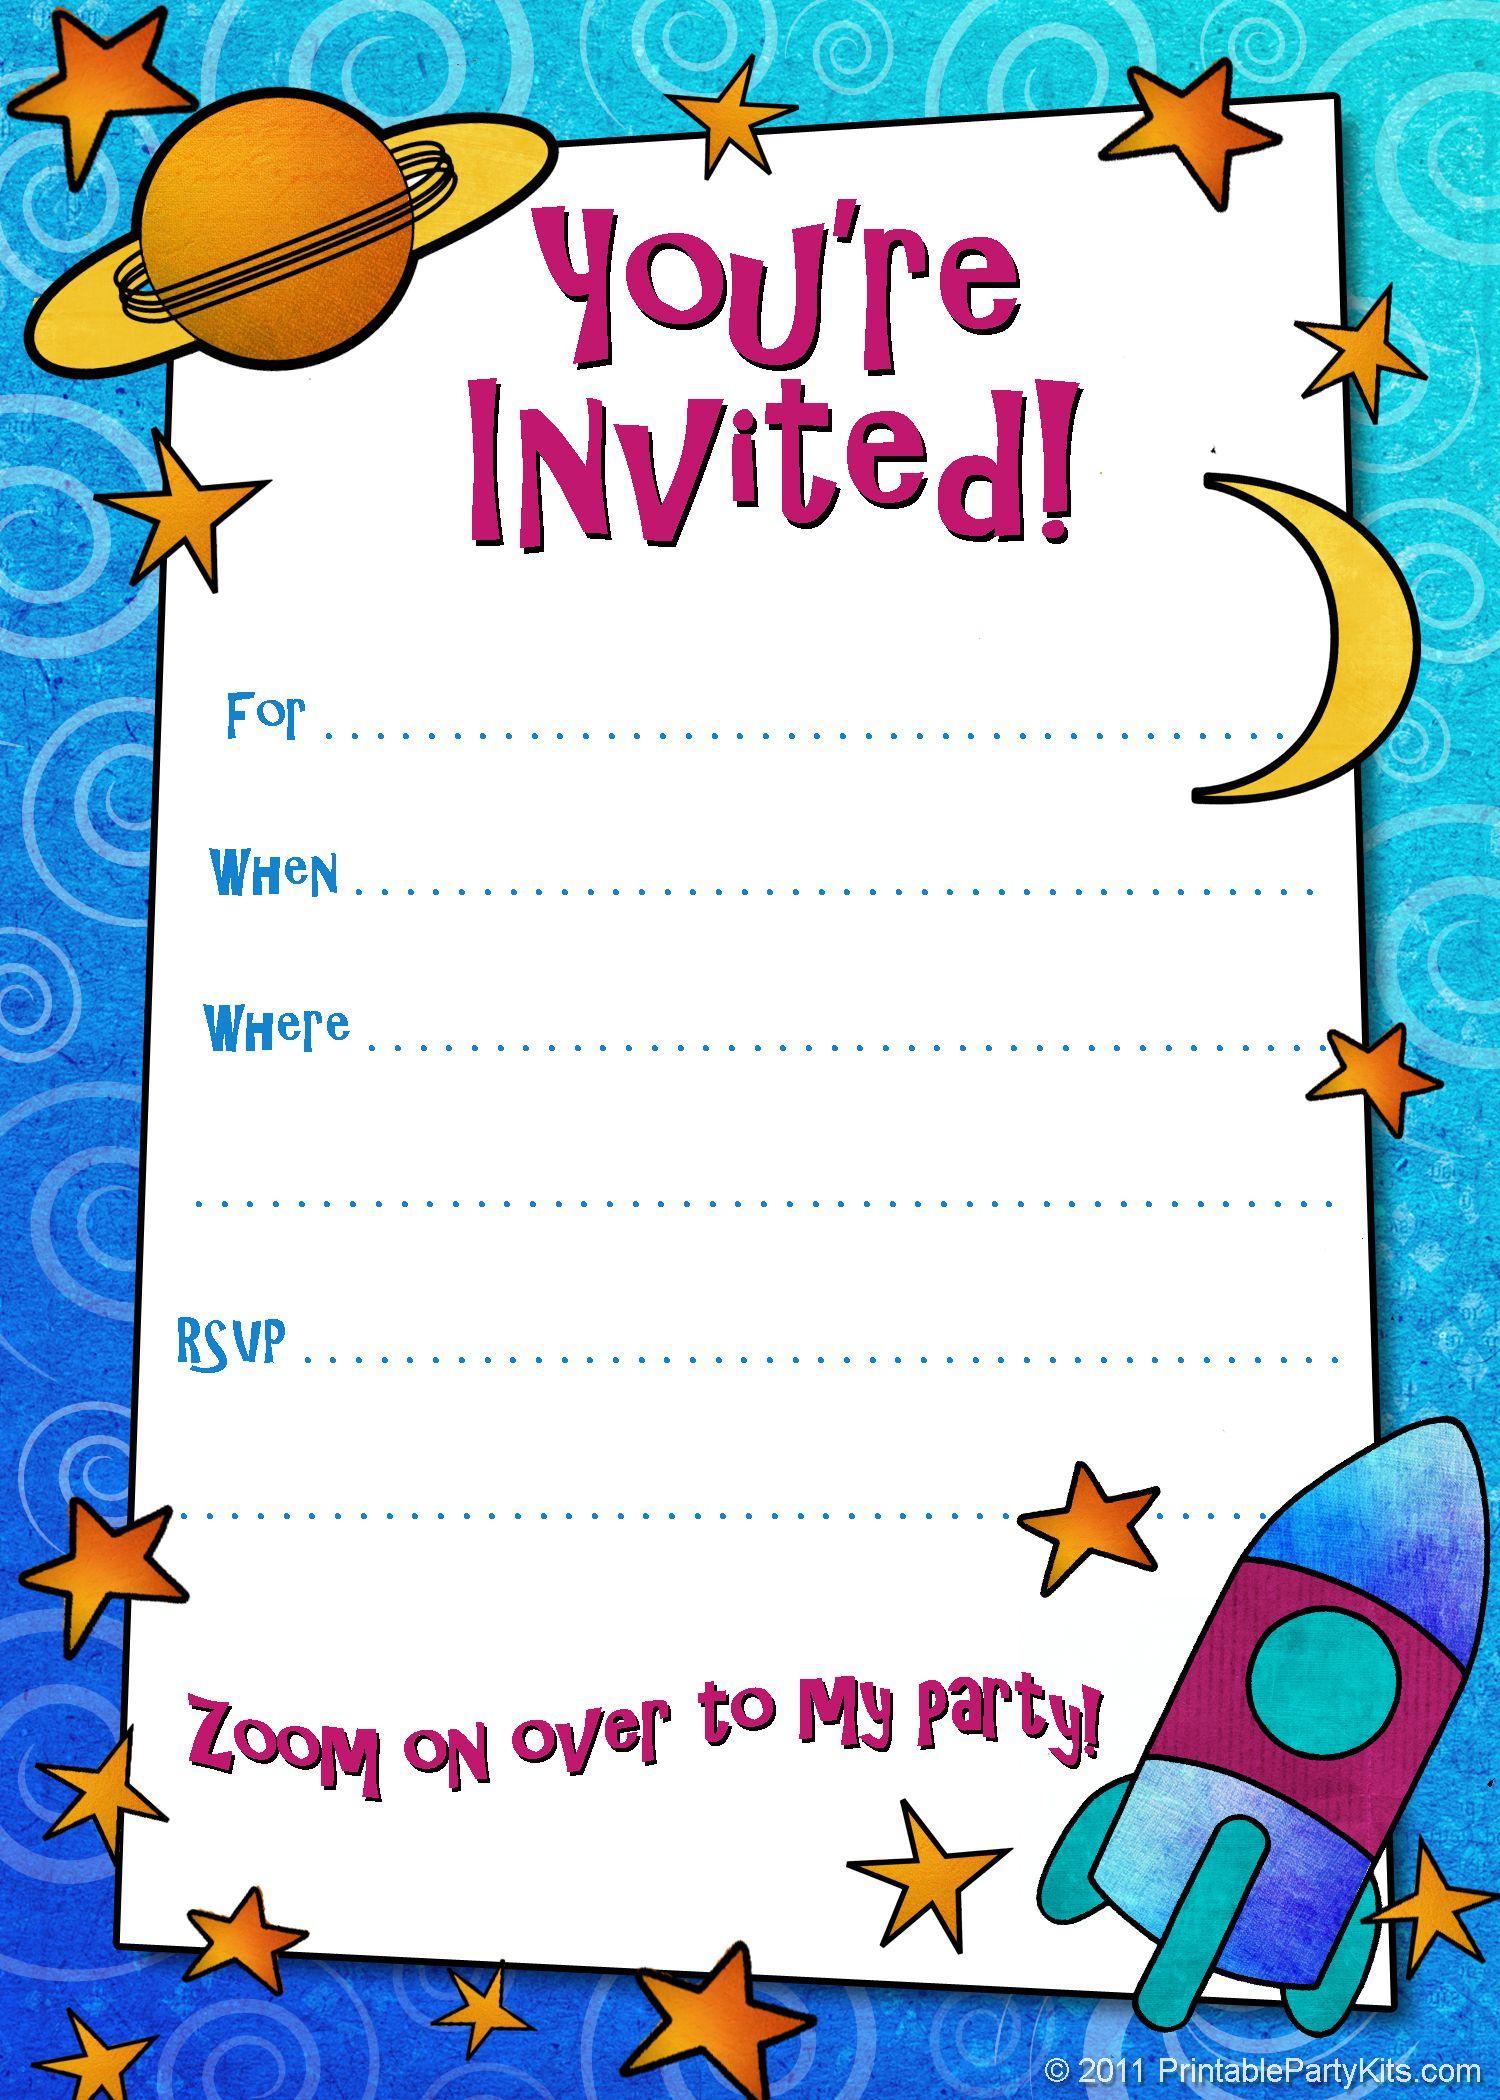 Free Printable Boys Birthday Party Invitations | Birthday Party - Free Printable Surprise Party Invitations